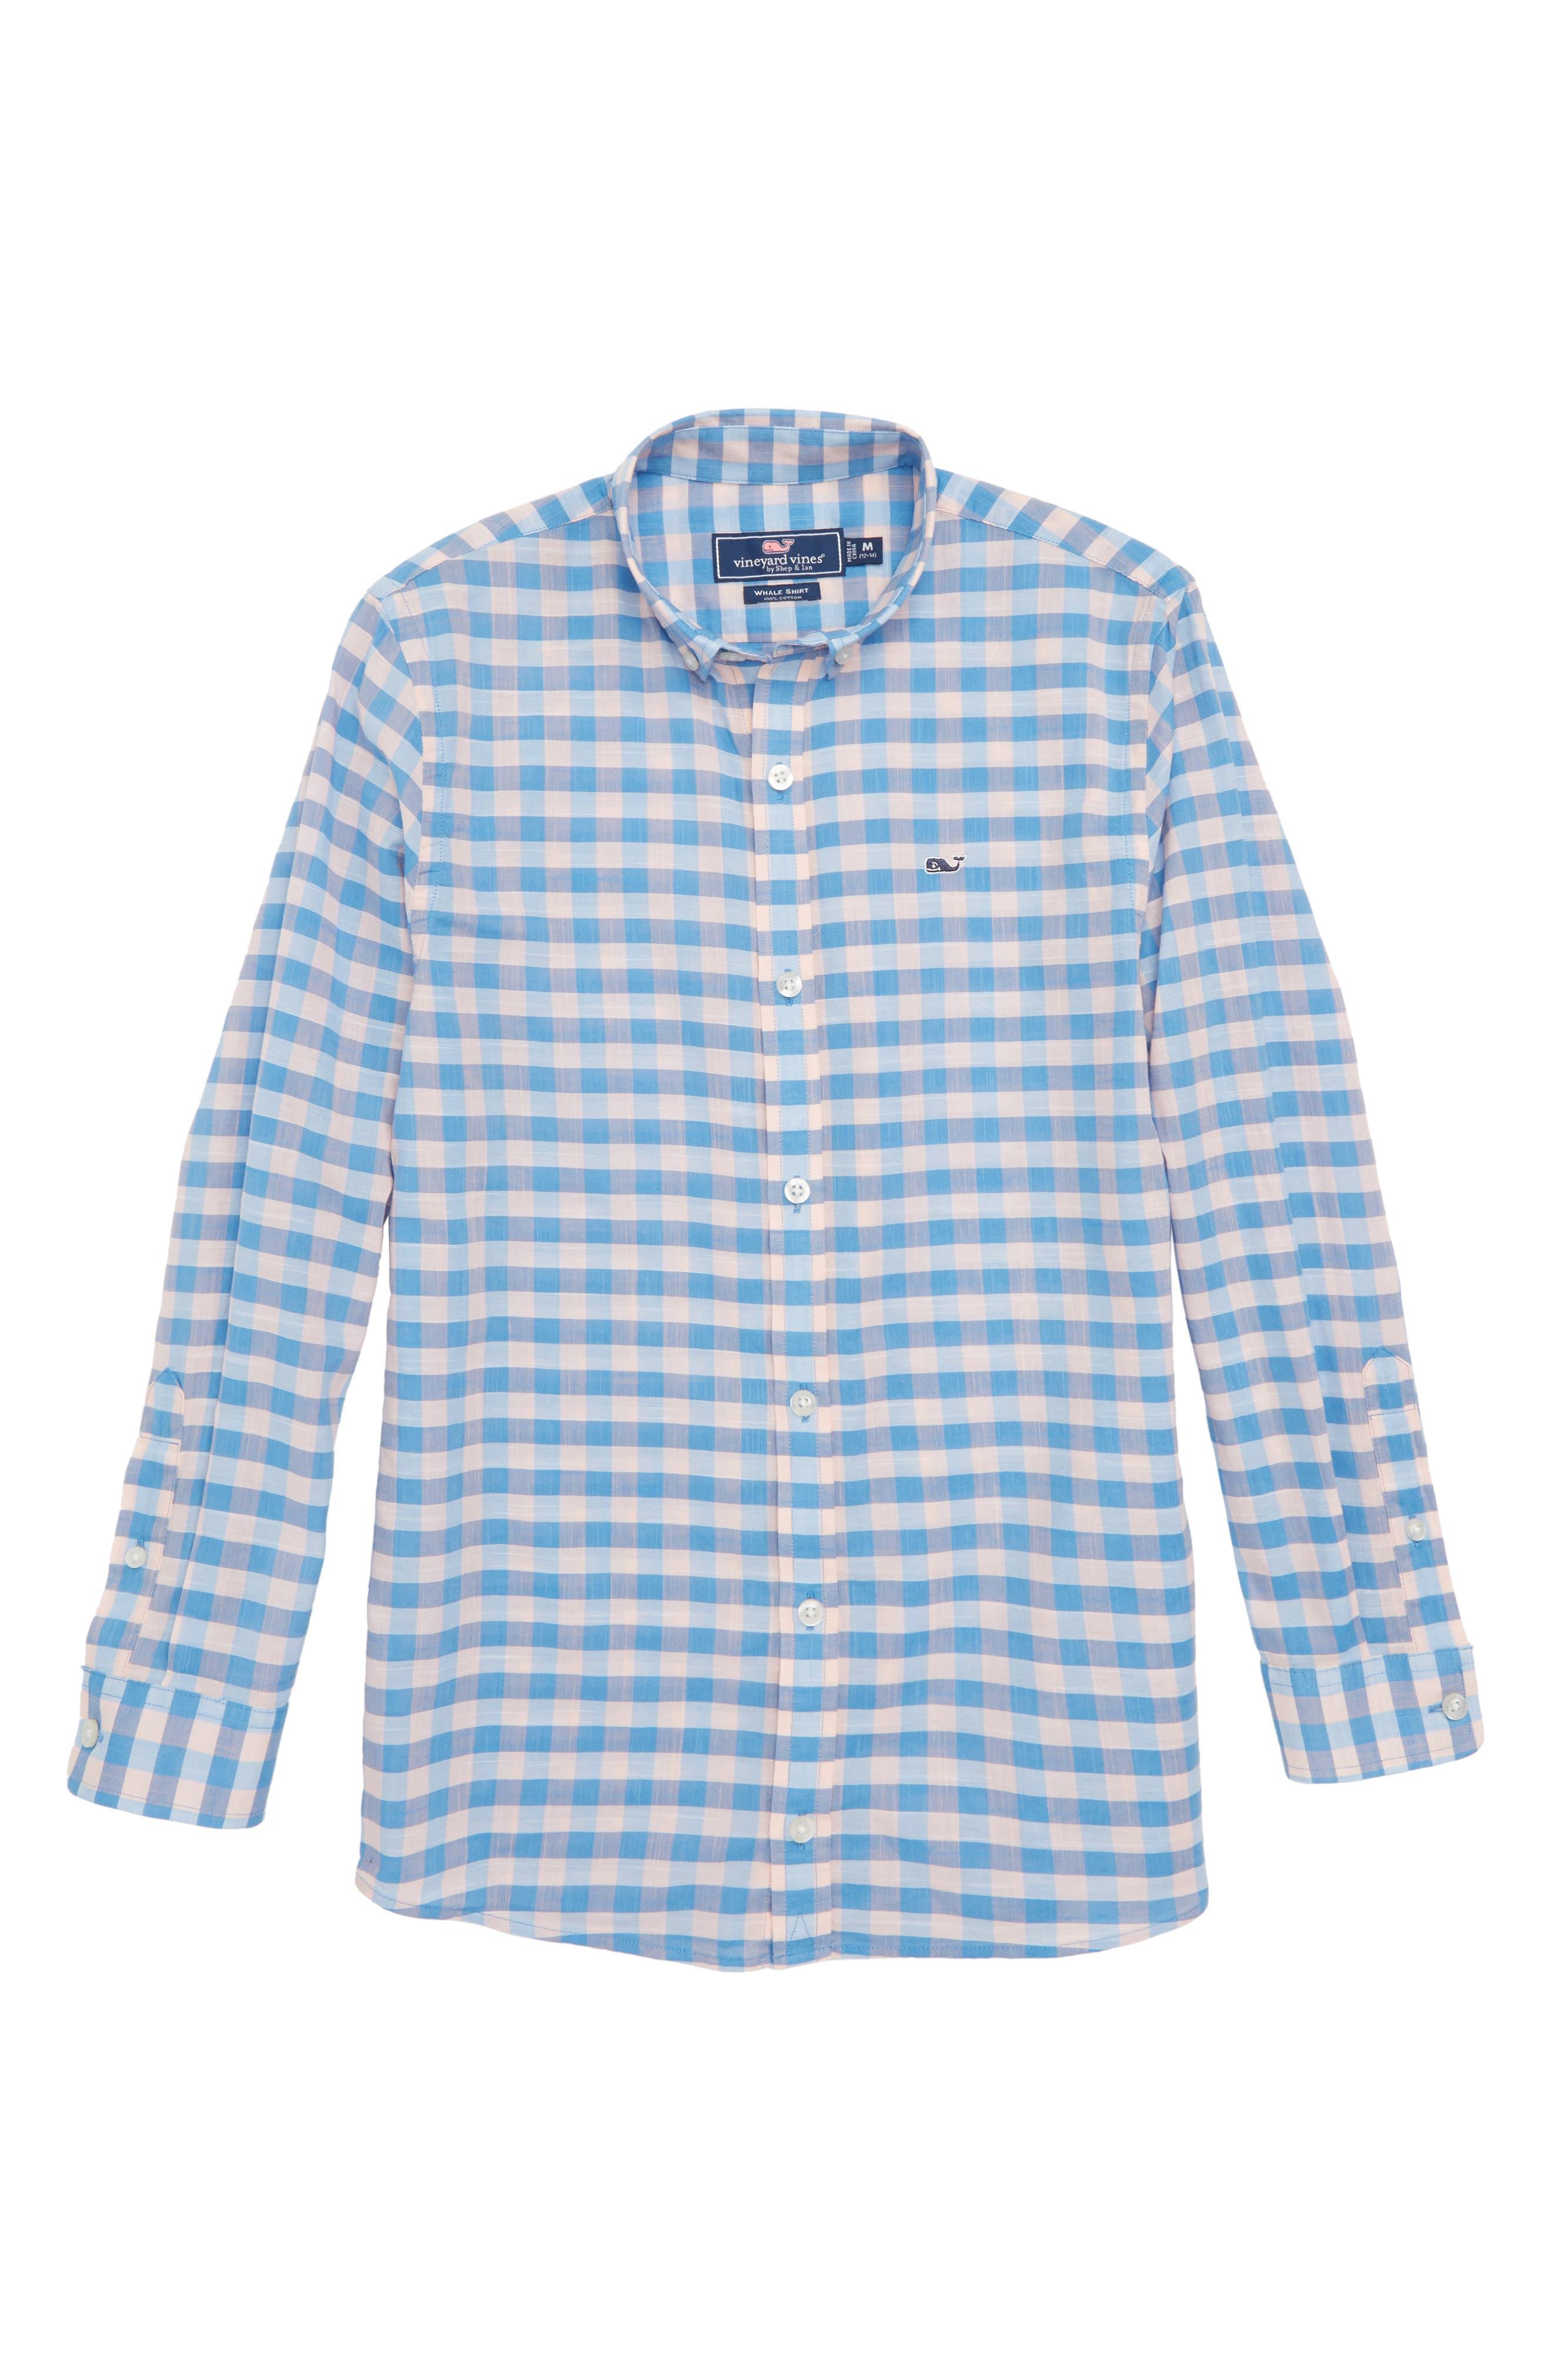 Pelican Cay Beach Check Woven Shirt,                             Main thumbnail 1, color,                             Peachy